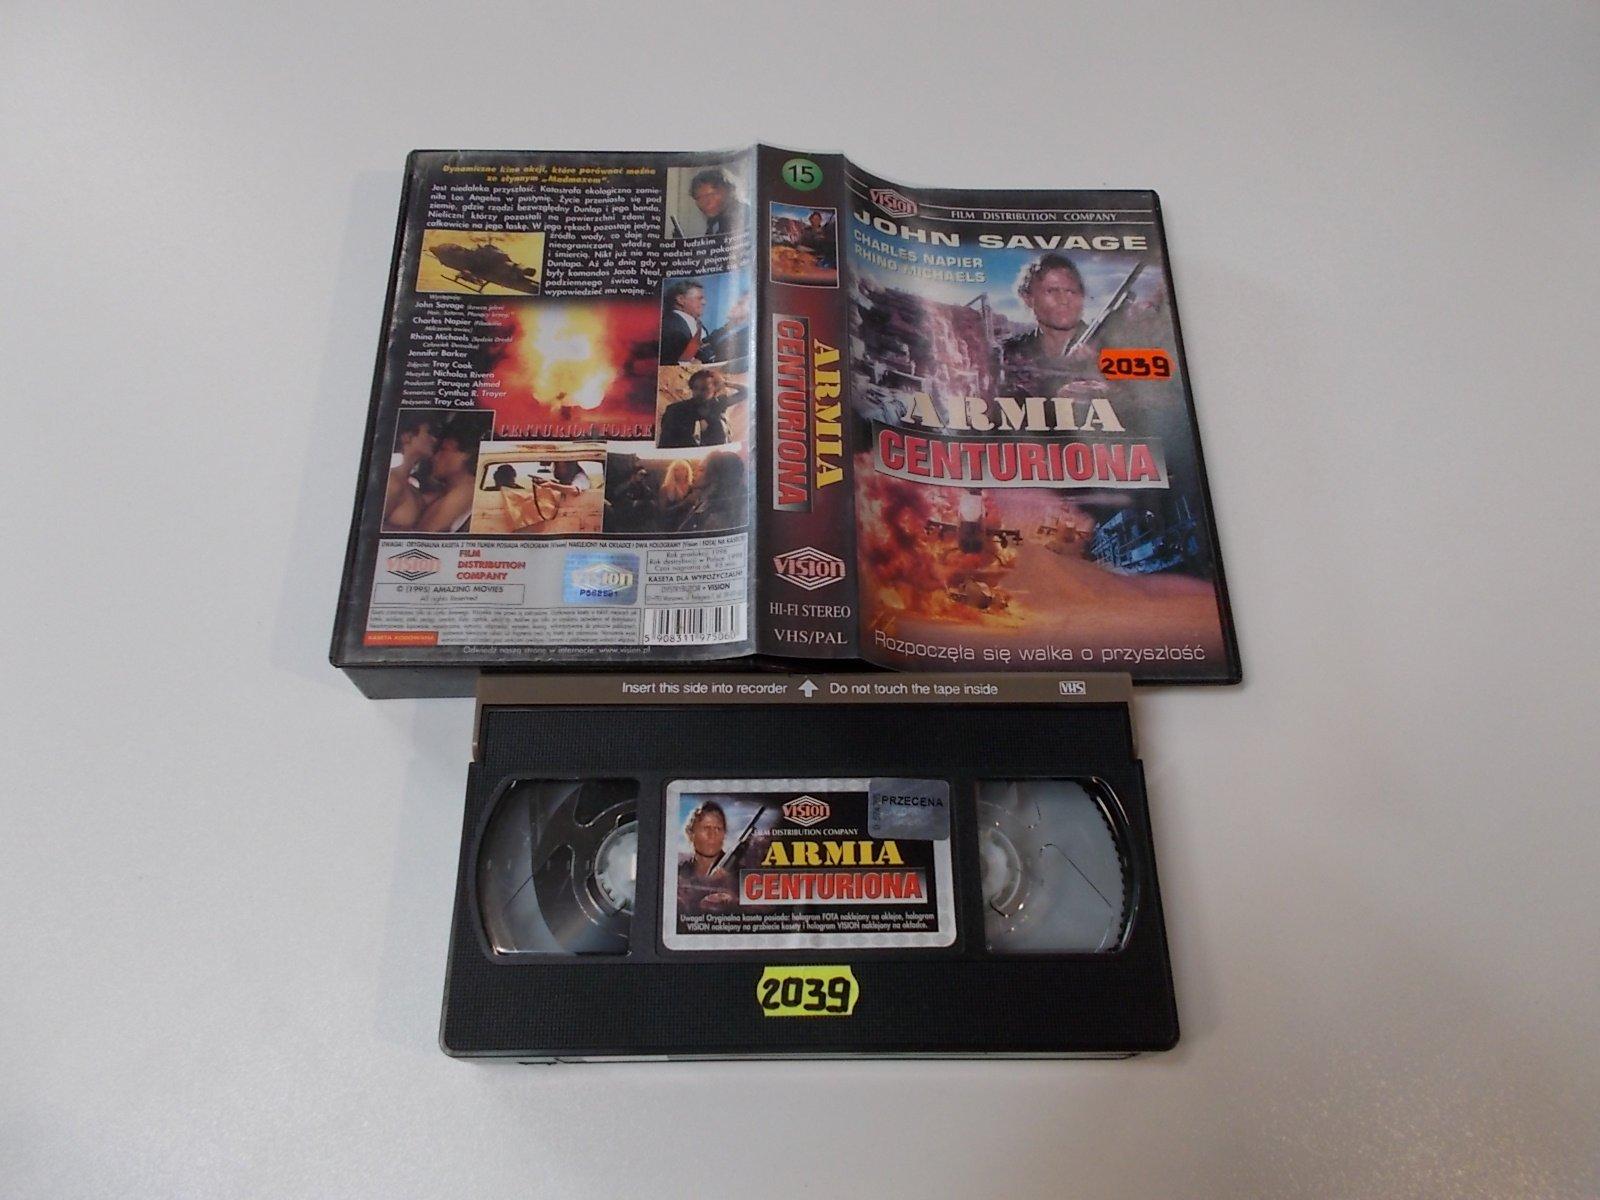 Armia Centuriona - VHS Kaseta Video - Opole 1669